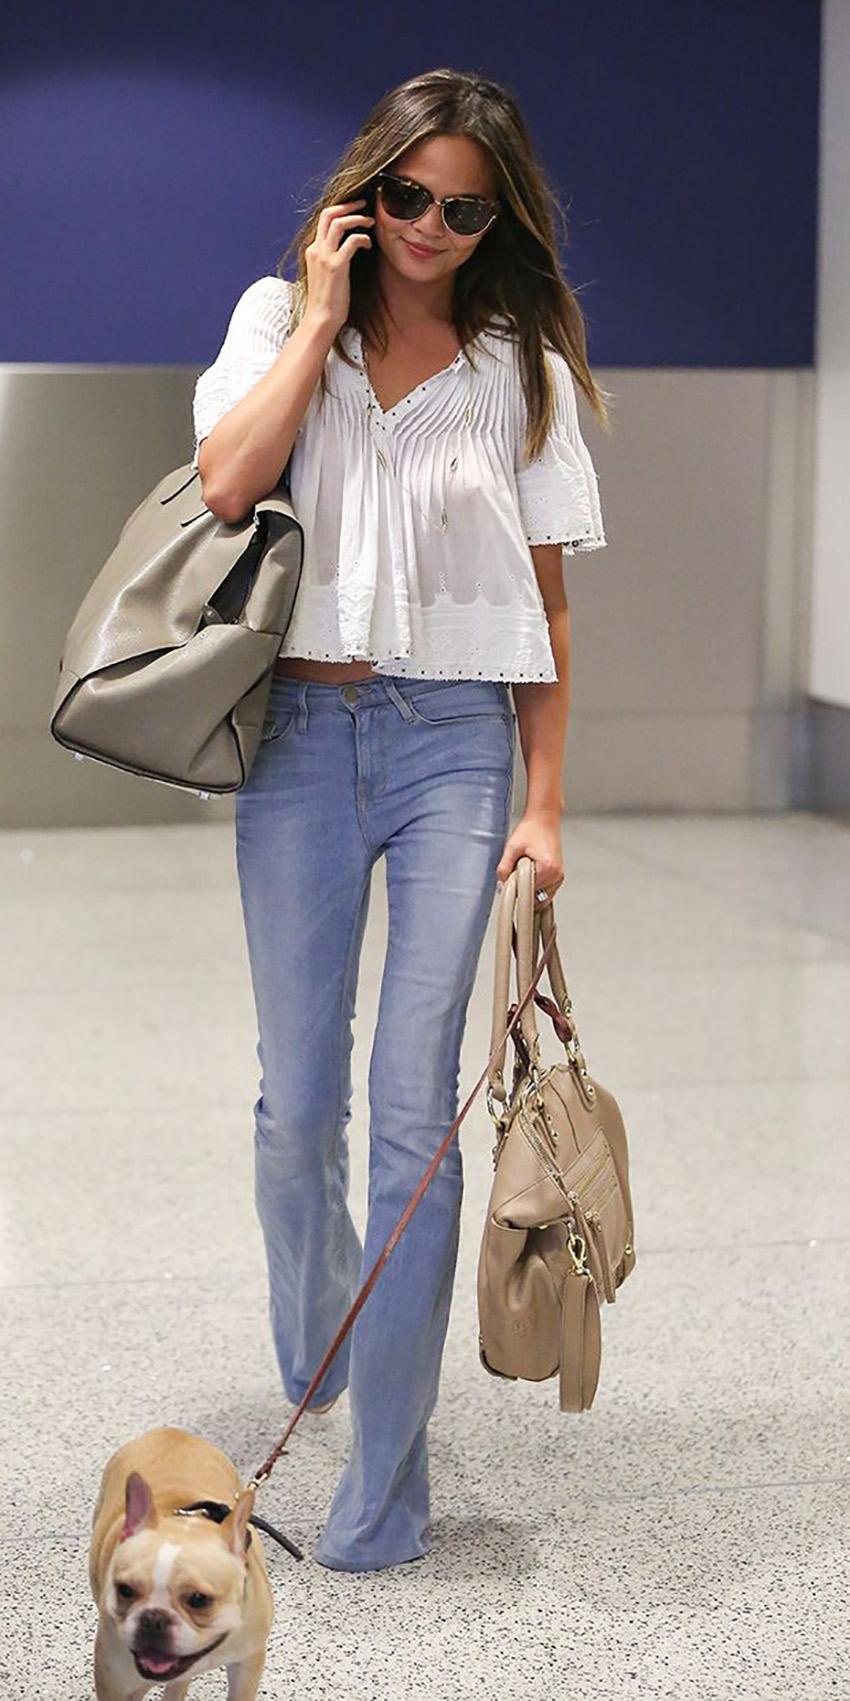 pantaloni-zampa-styleshouts-karlie-kloss-denim-white-shirt